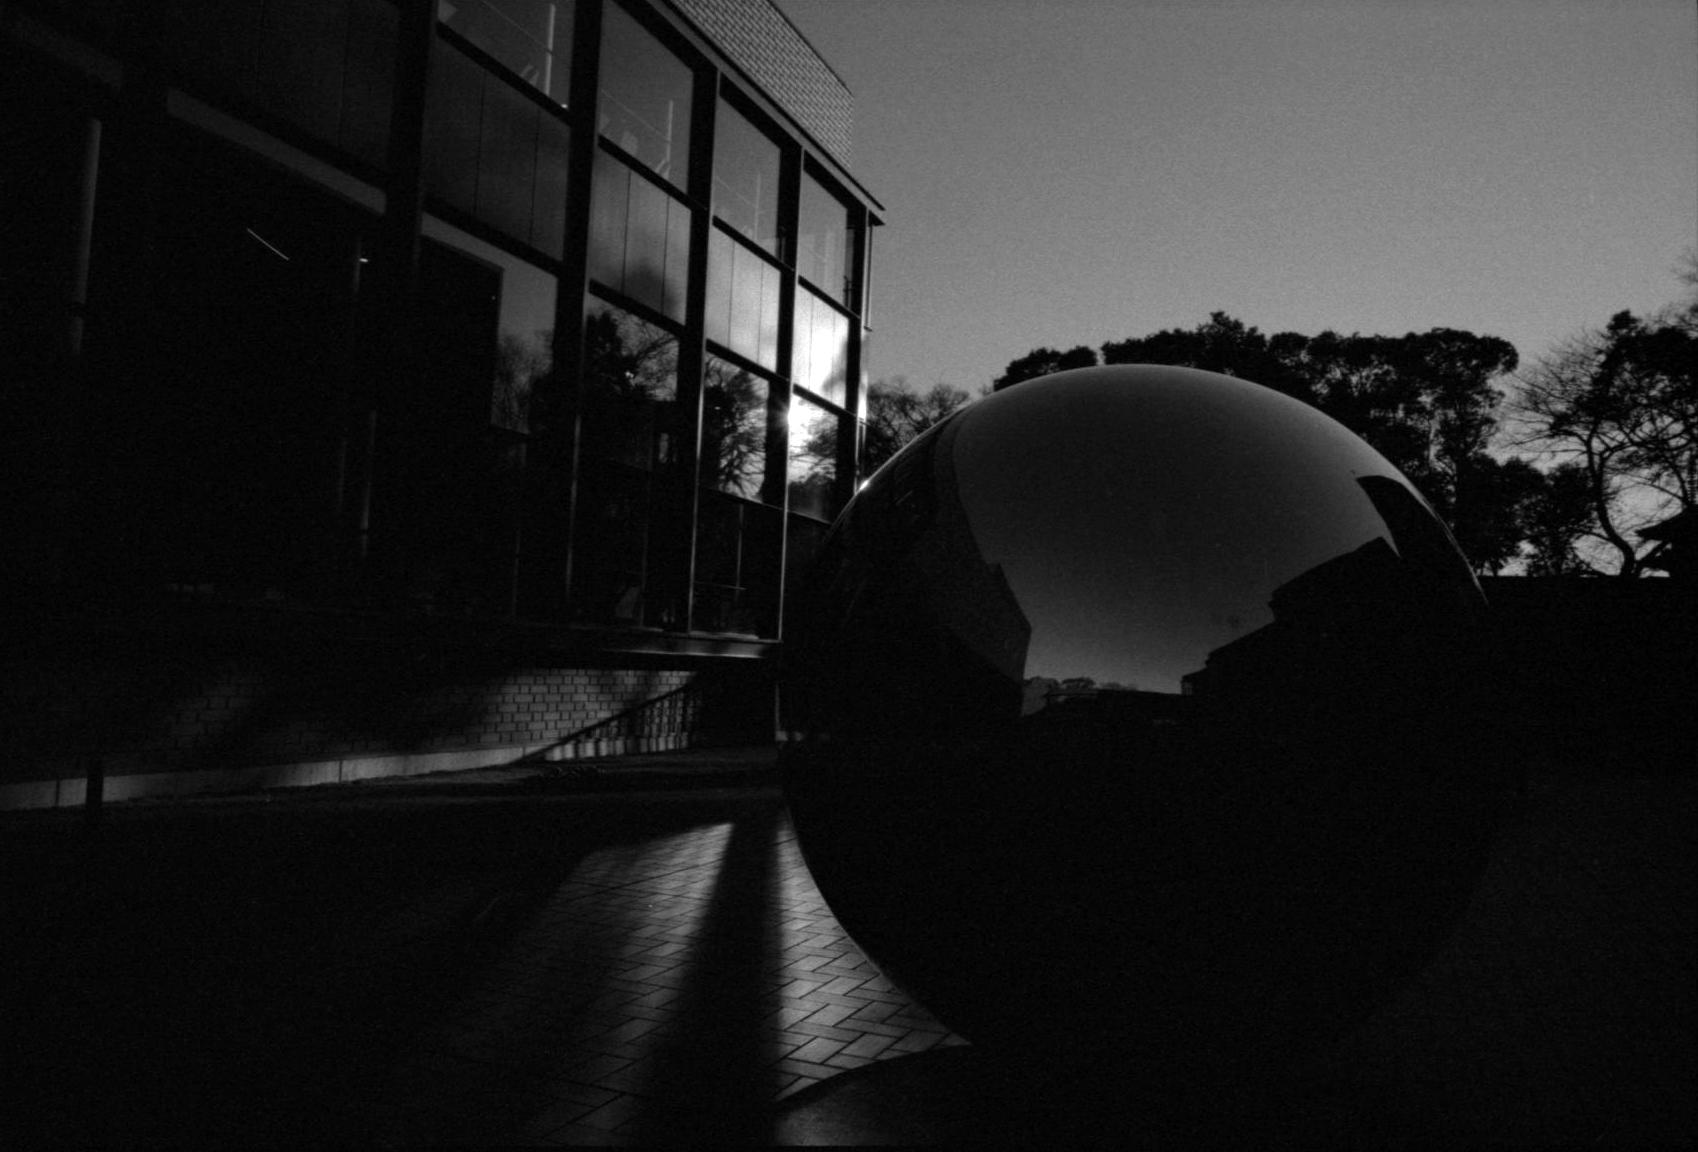 20140123 LeicaM4-P Biogon25ZM TMY TMD 018